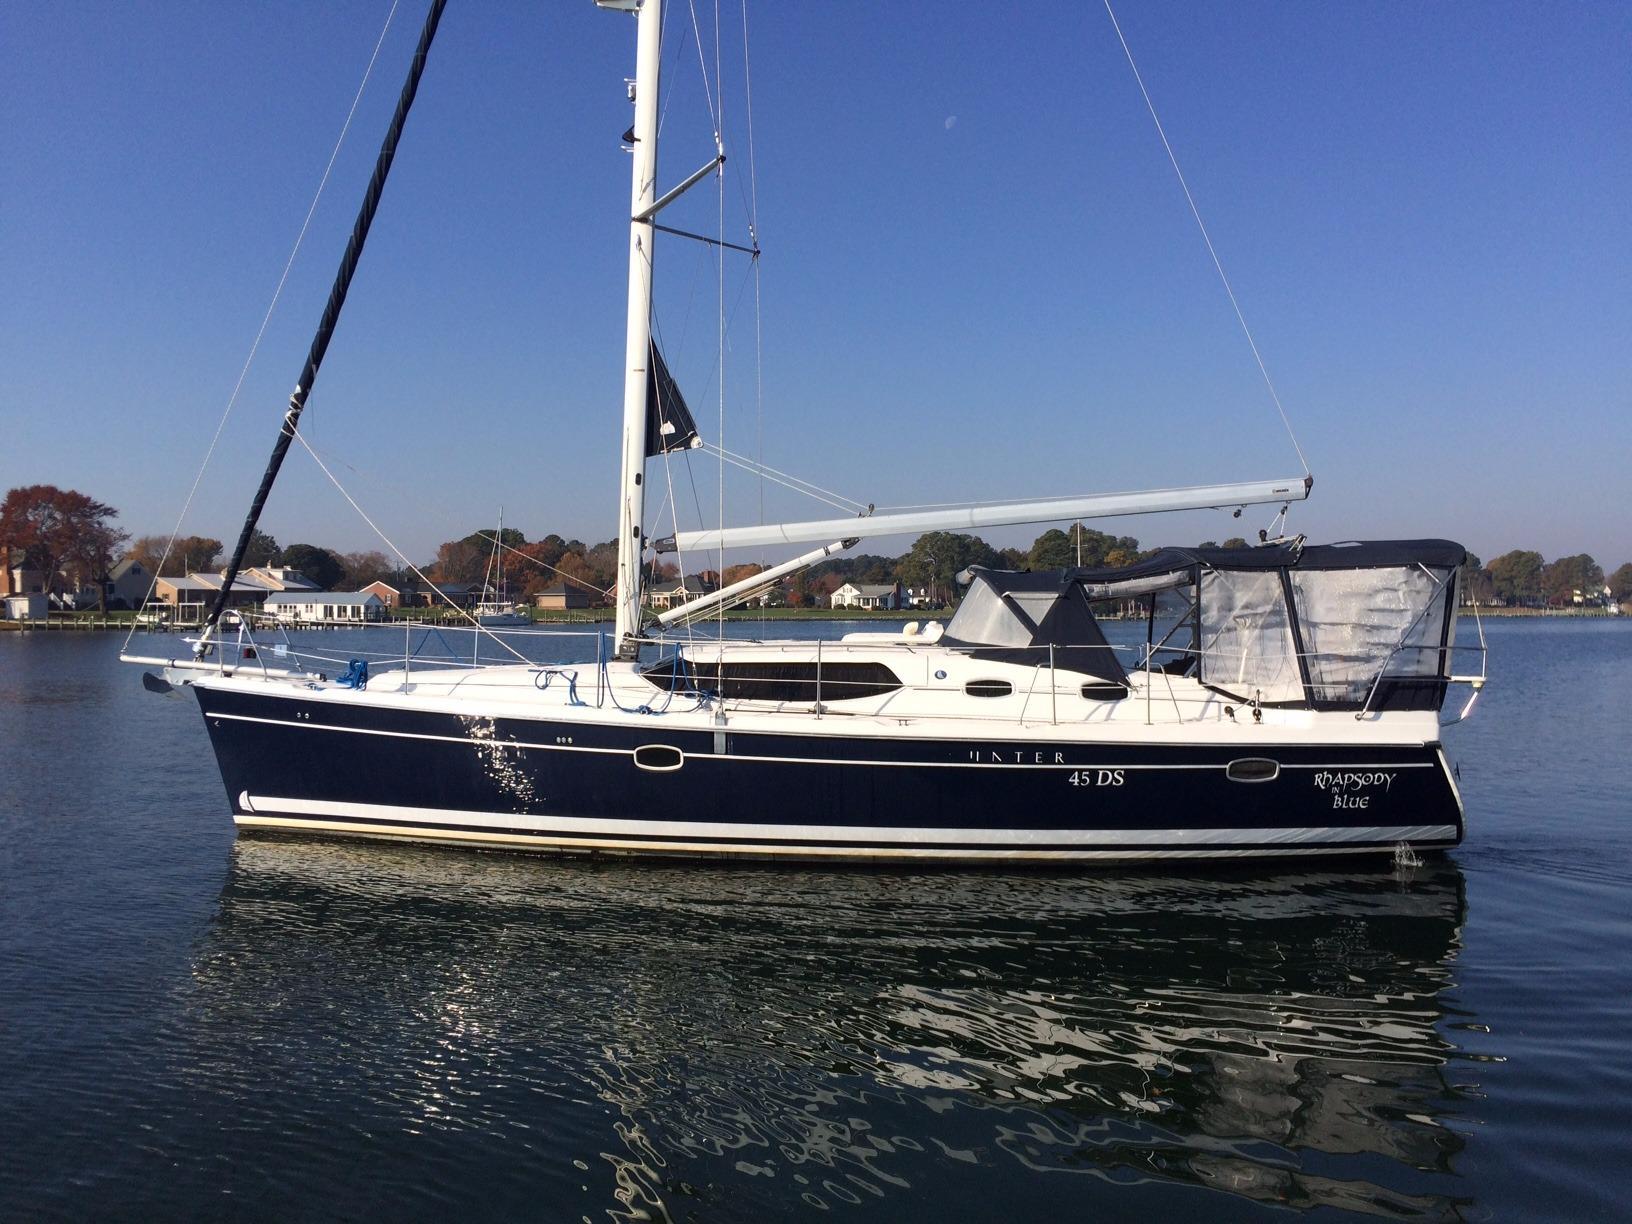 45 hunter rhapsody in blue 2008 unknown denison yacht sales